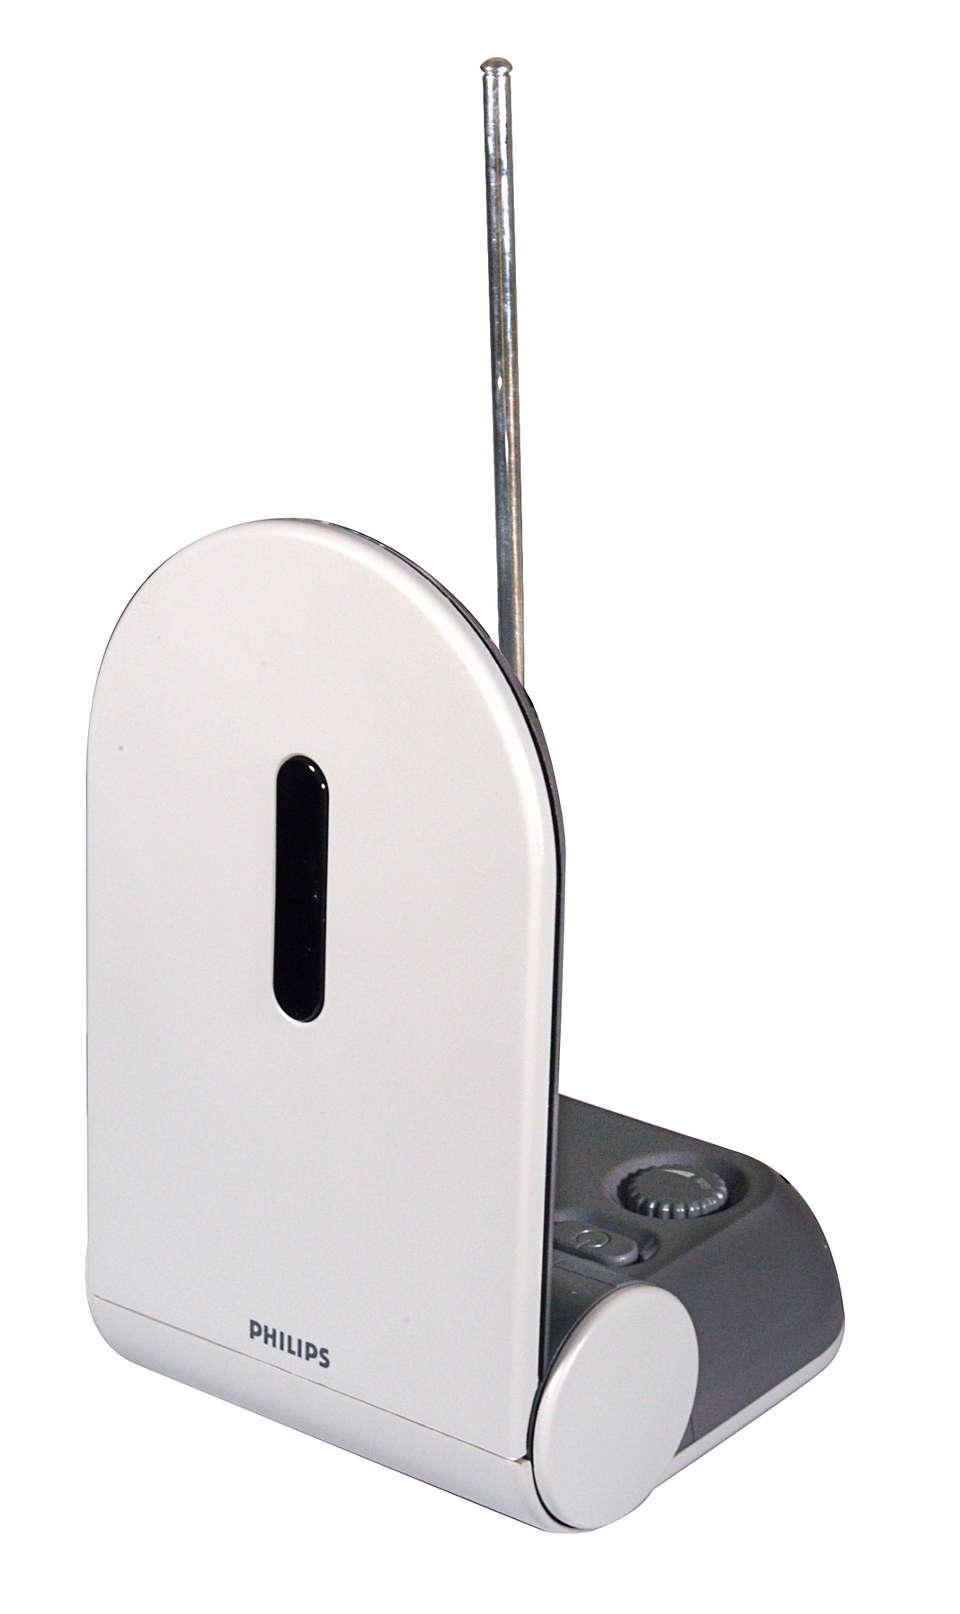 Прием аналогового и цифрового ТВ